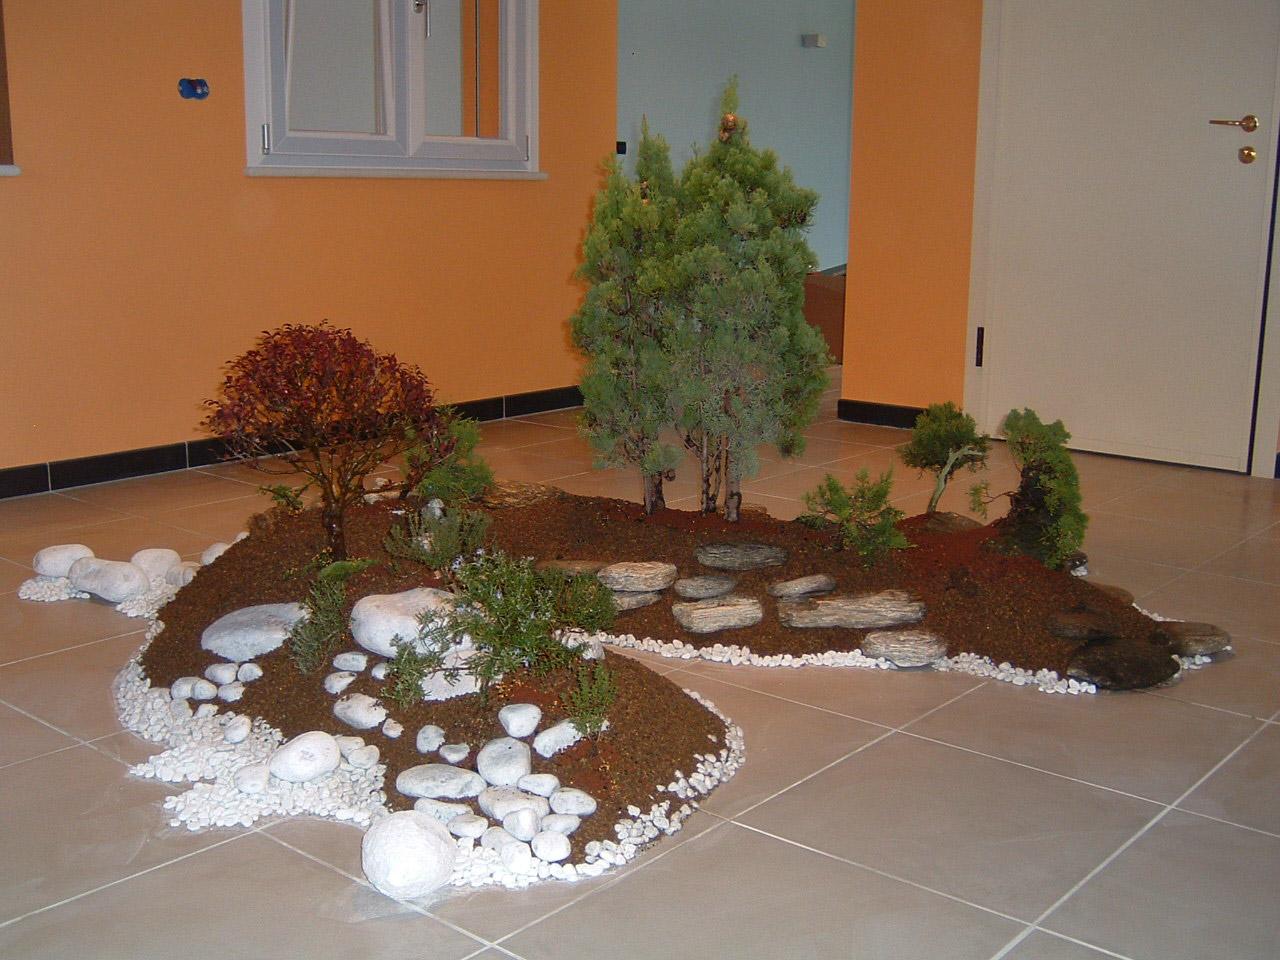 Giardini in miniatura bonsai prebonsai economico for Giardini in miniatura giapponesi